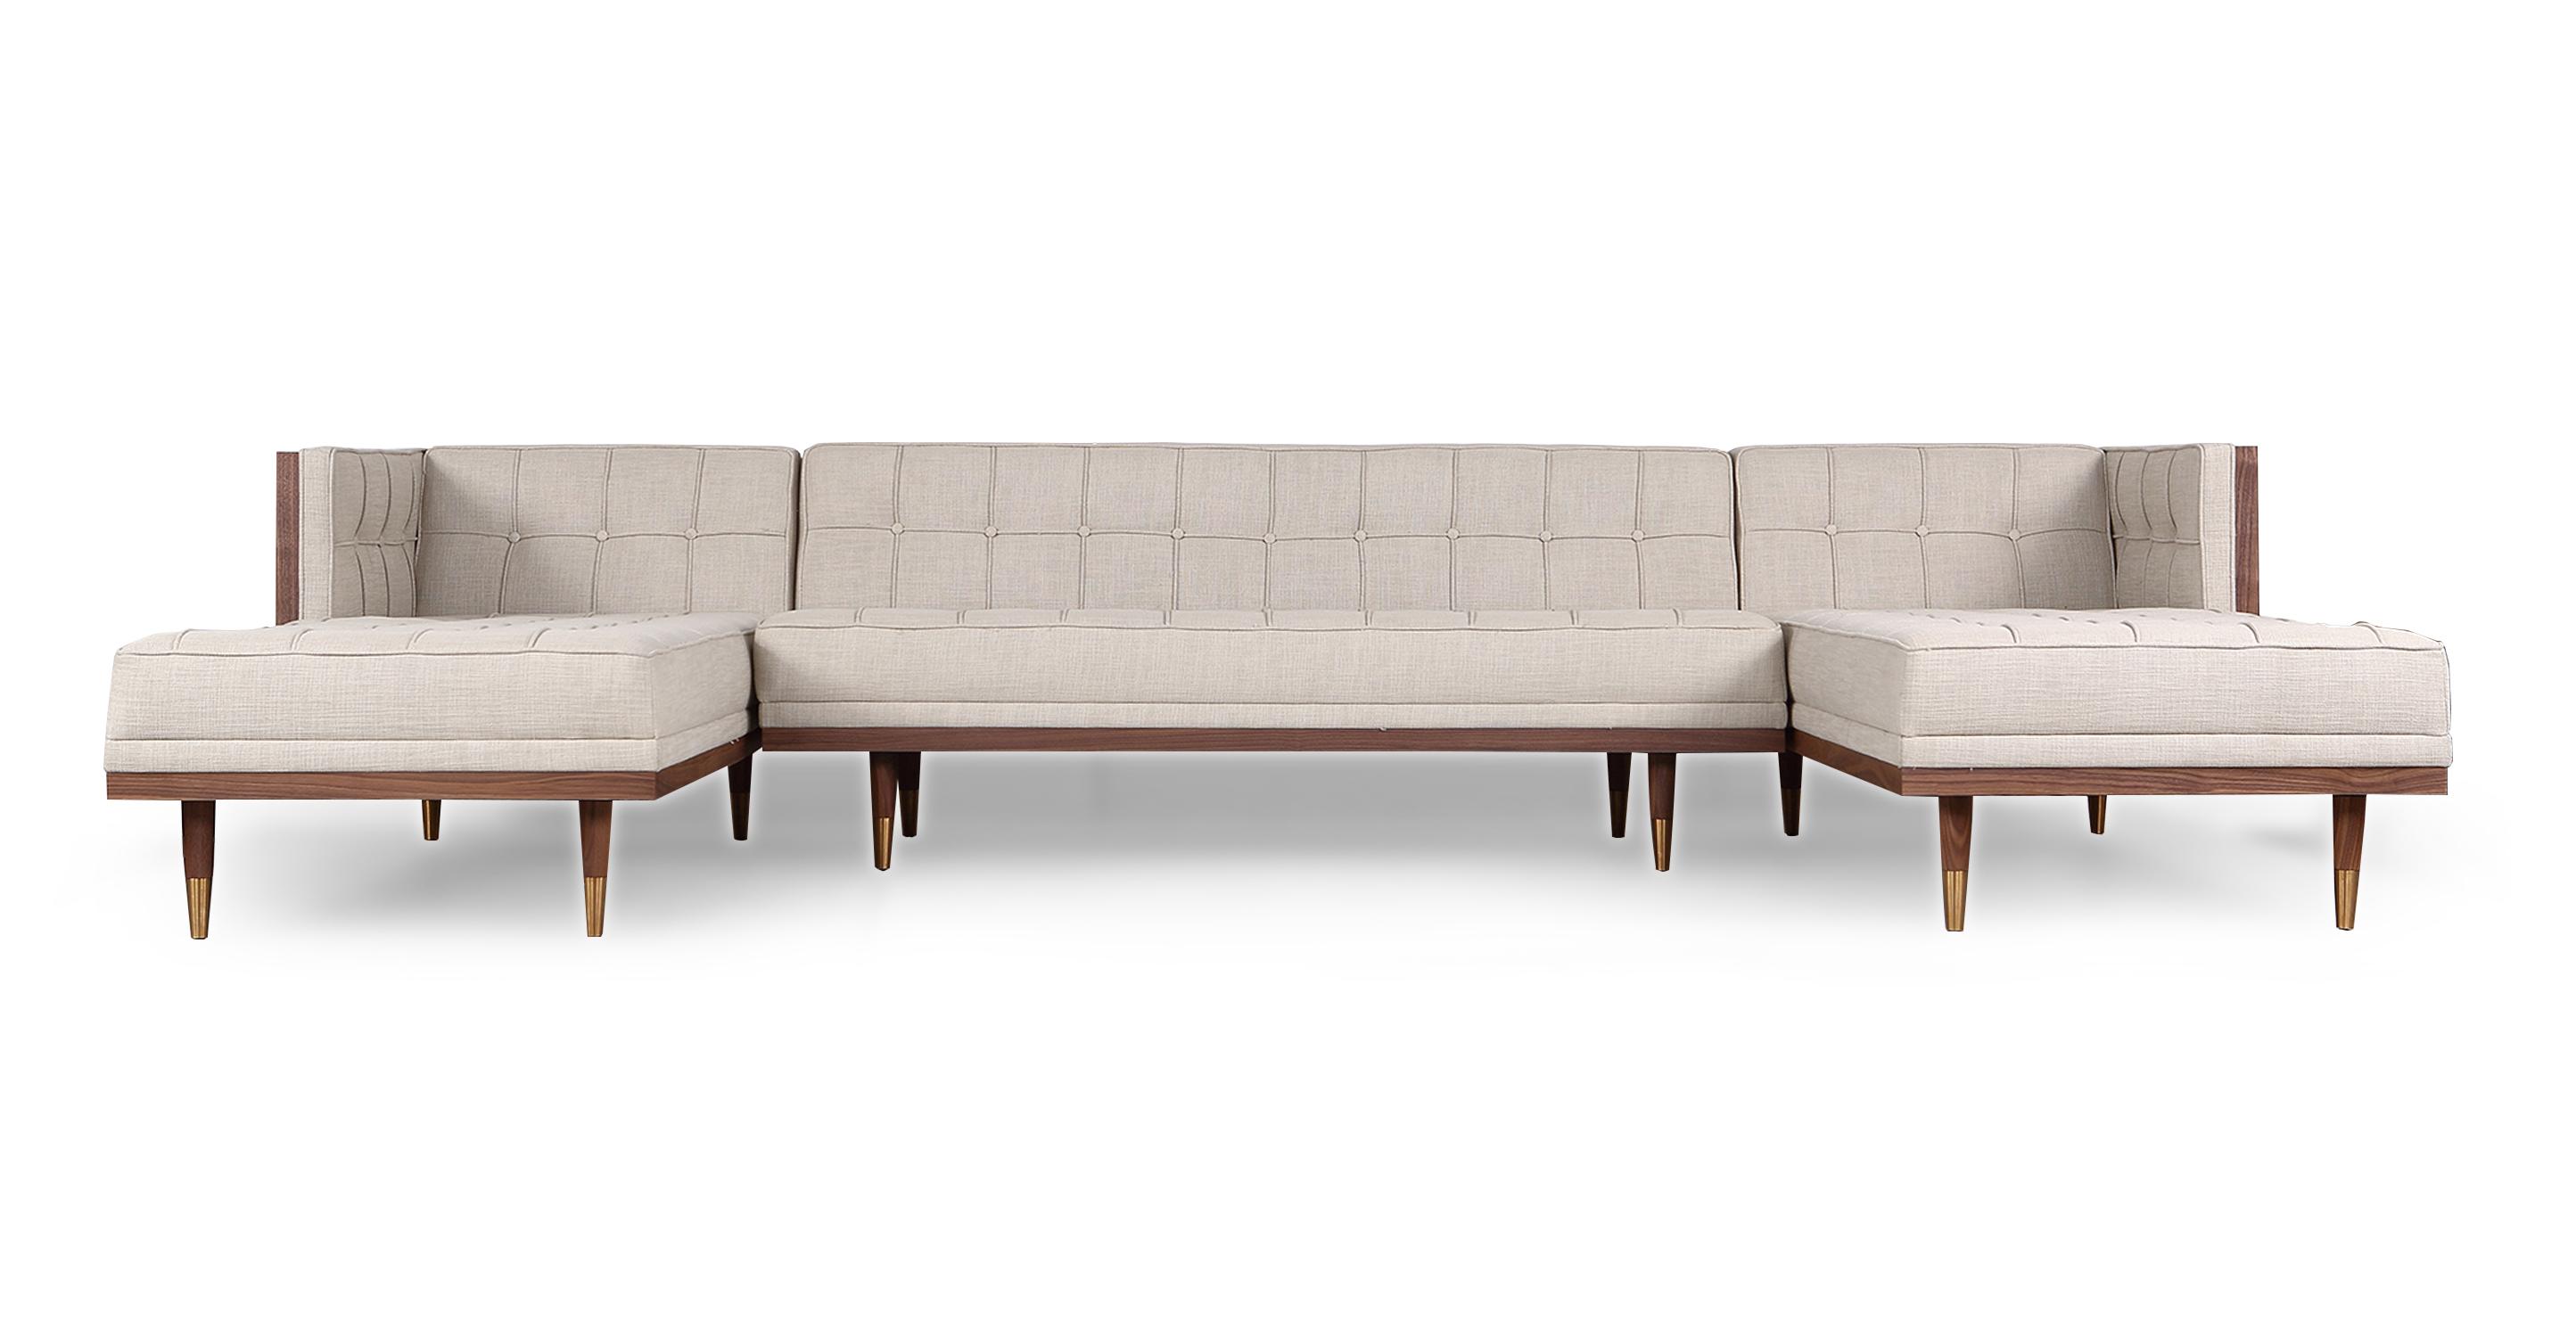 "Woodrow Box 126"" Sofa U-Sectional, Walnut/Urban Hemp"